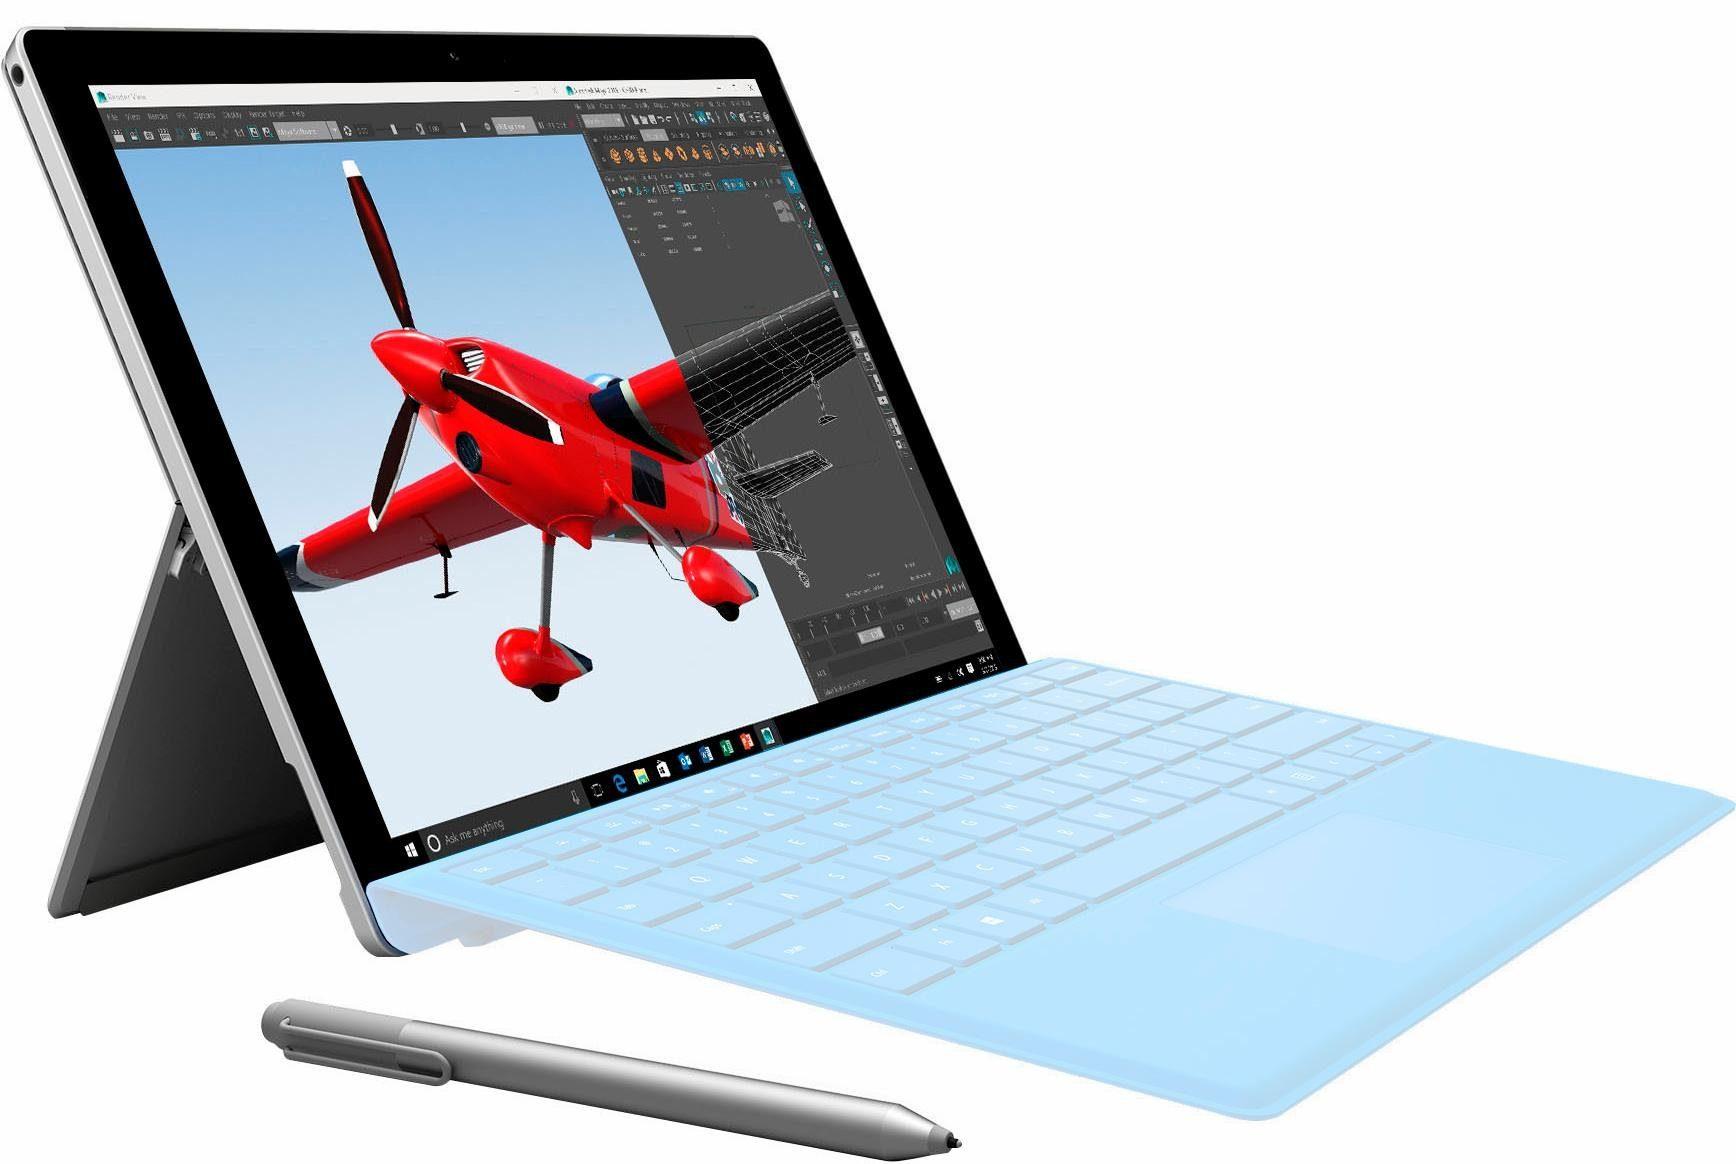 Microsoft Surface Pro 4 TH4-00003 Tablet-PC, Microsoft® Windows® 10 Home, Intel Core i7